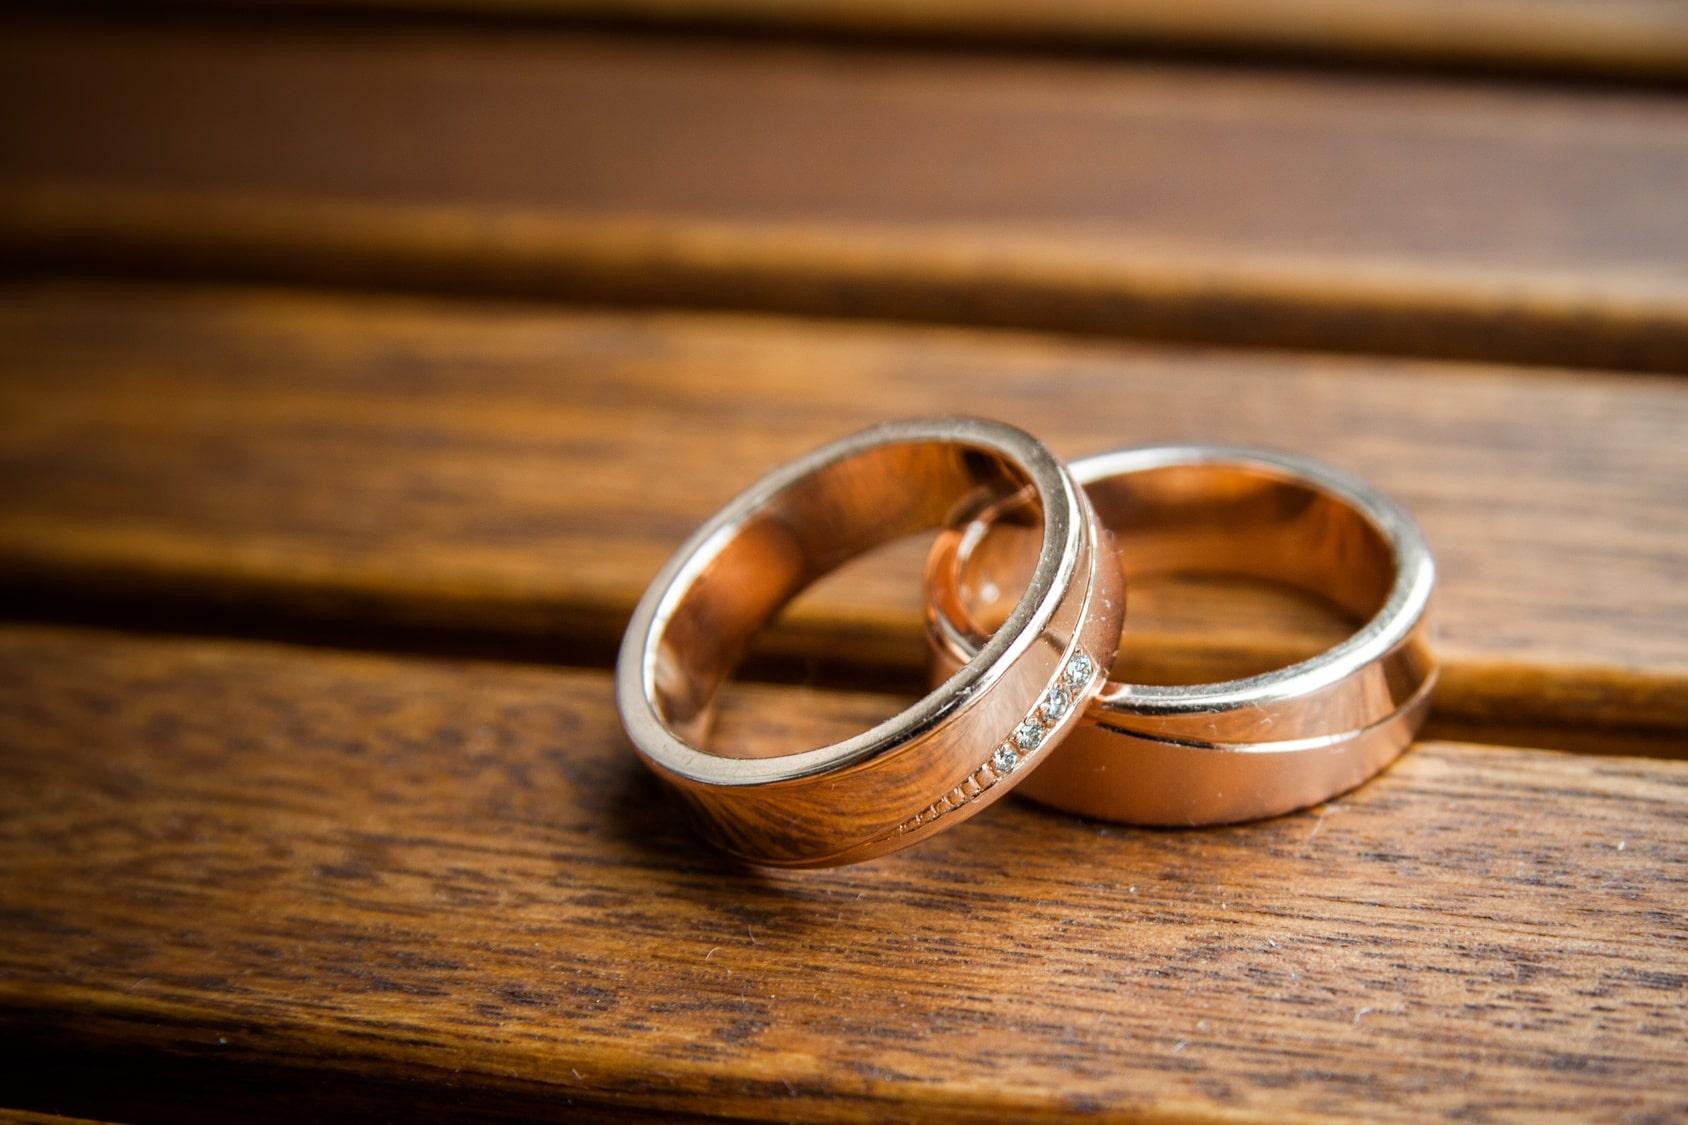 reunion couples eglise baptiste nice